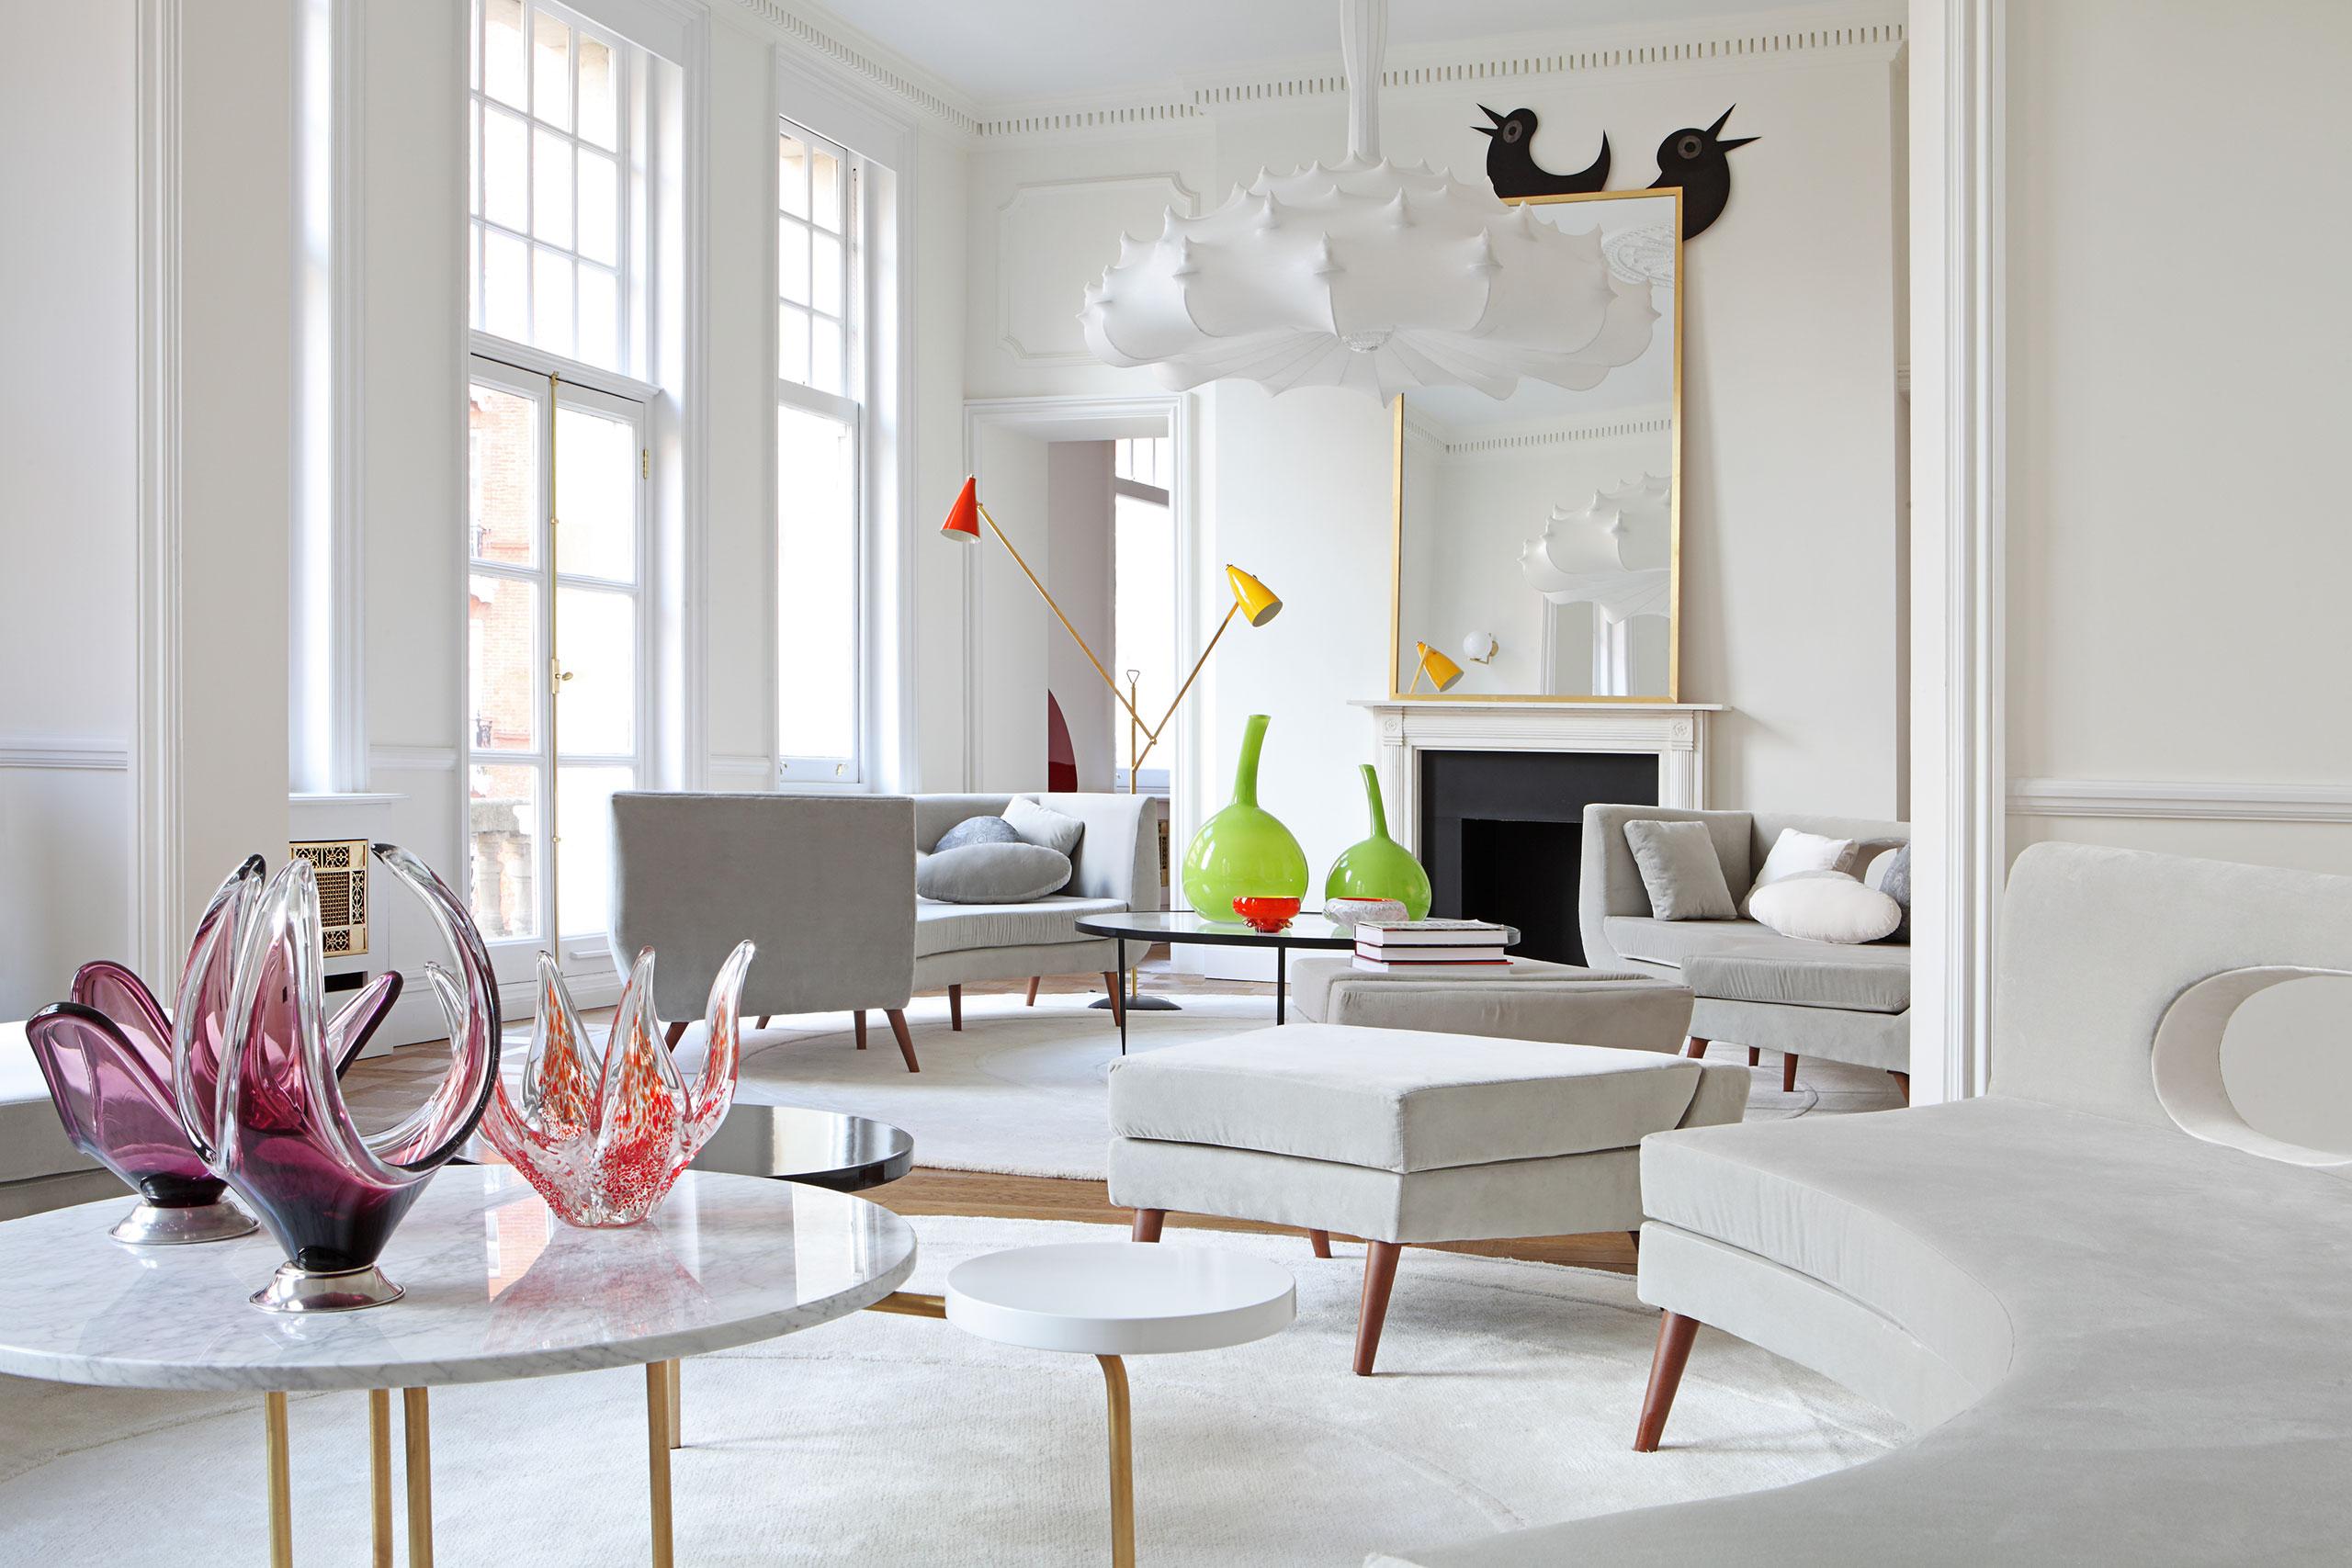 Teresa Sapey Estudio, Appartamento in South Kensington, Londra, 2016